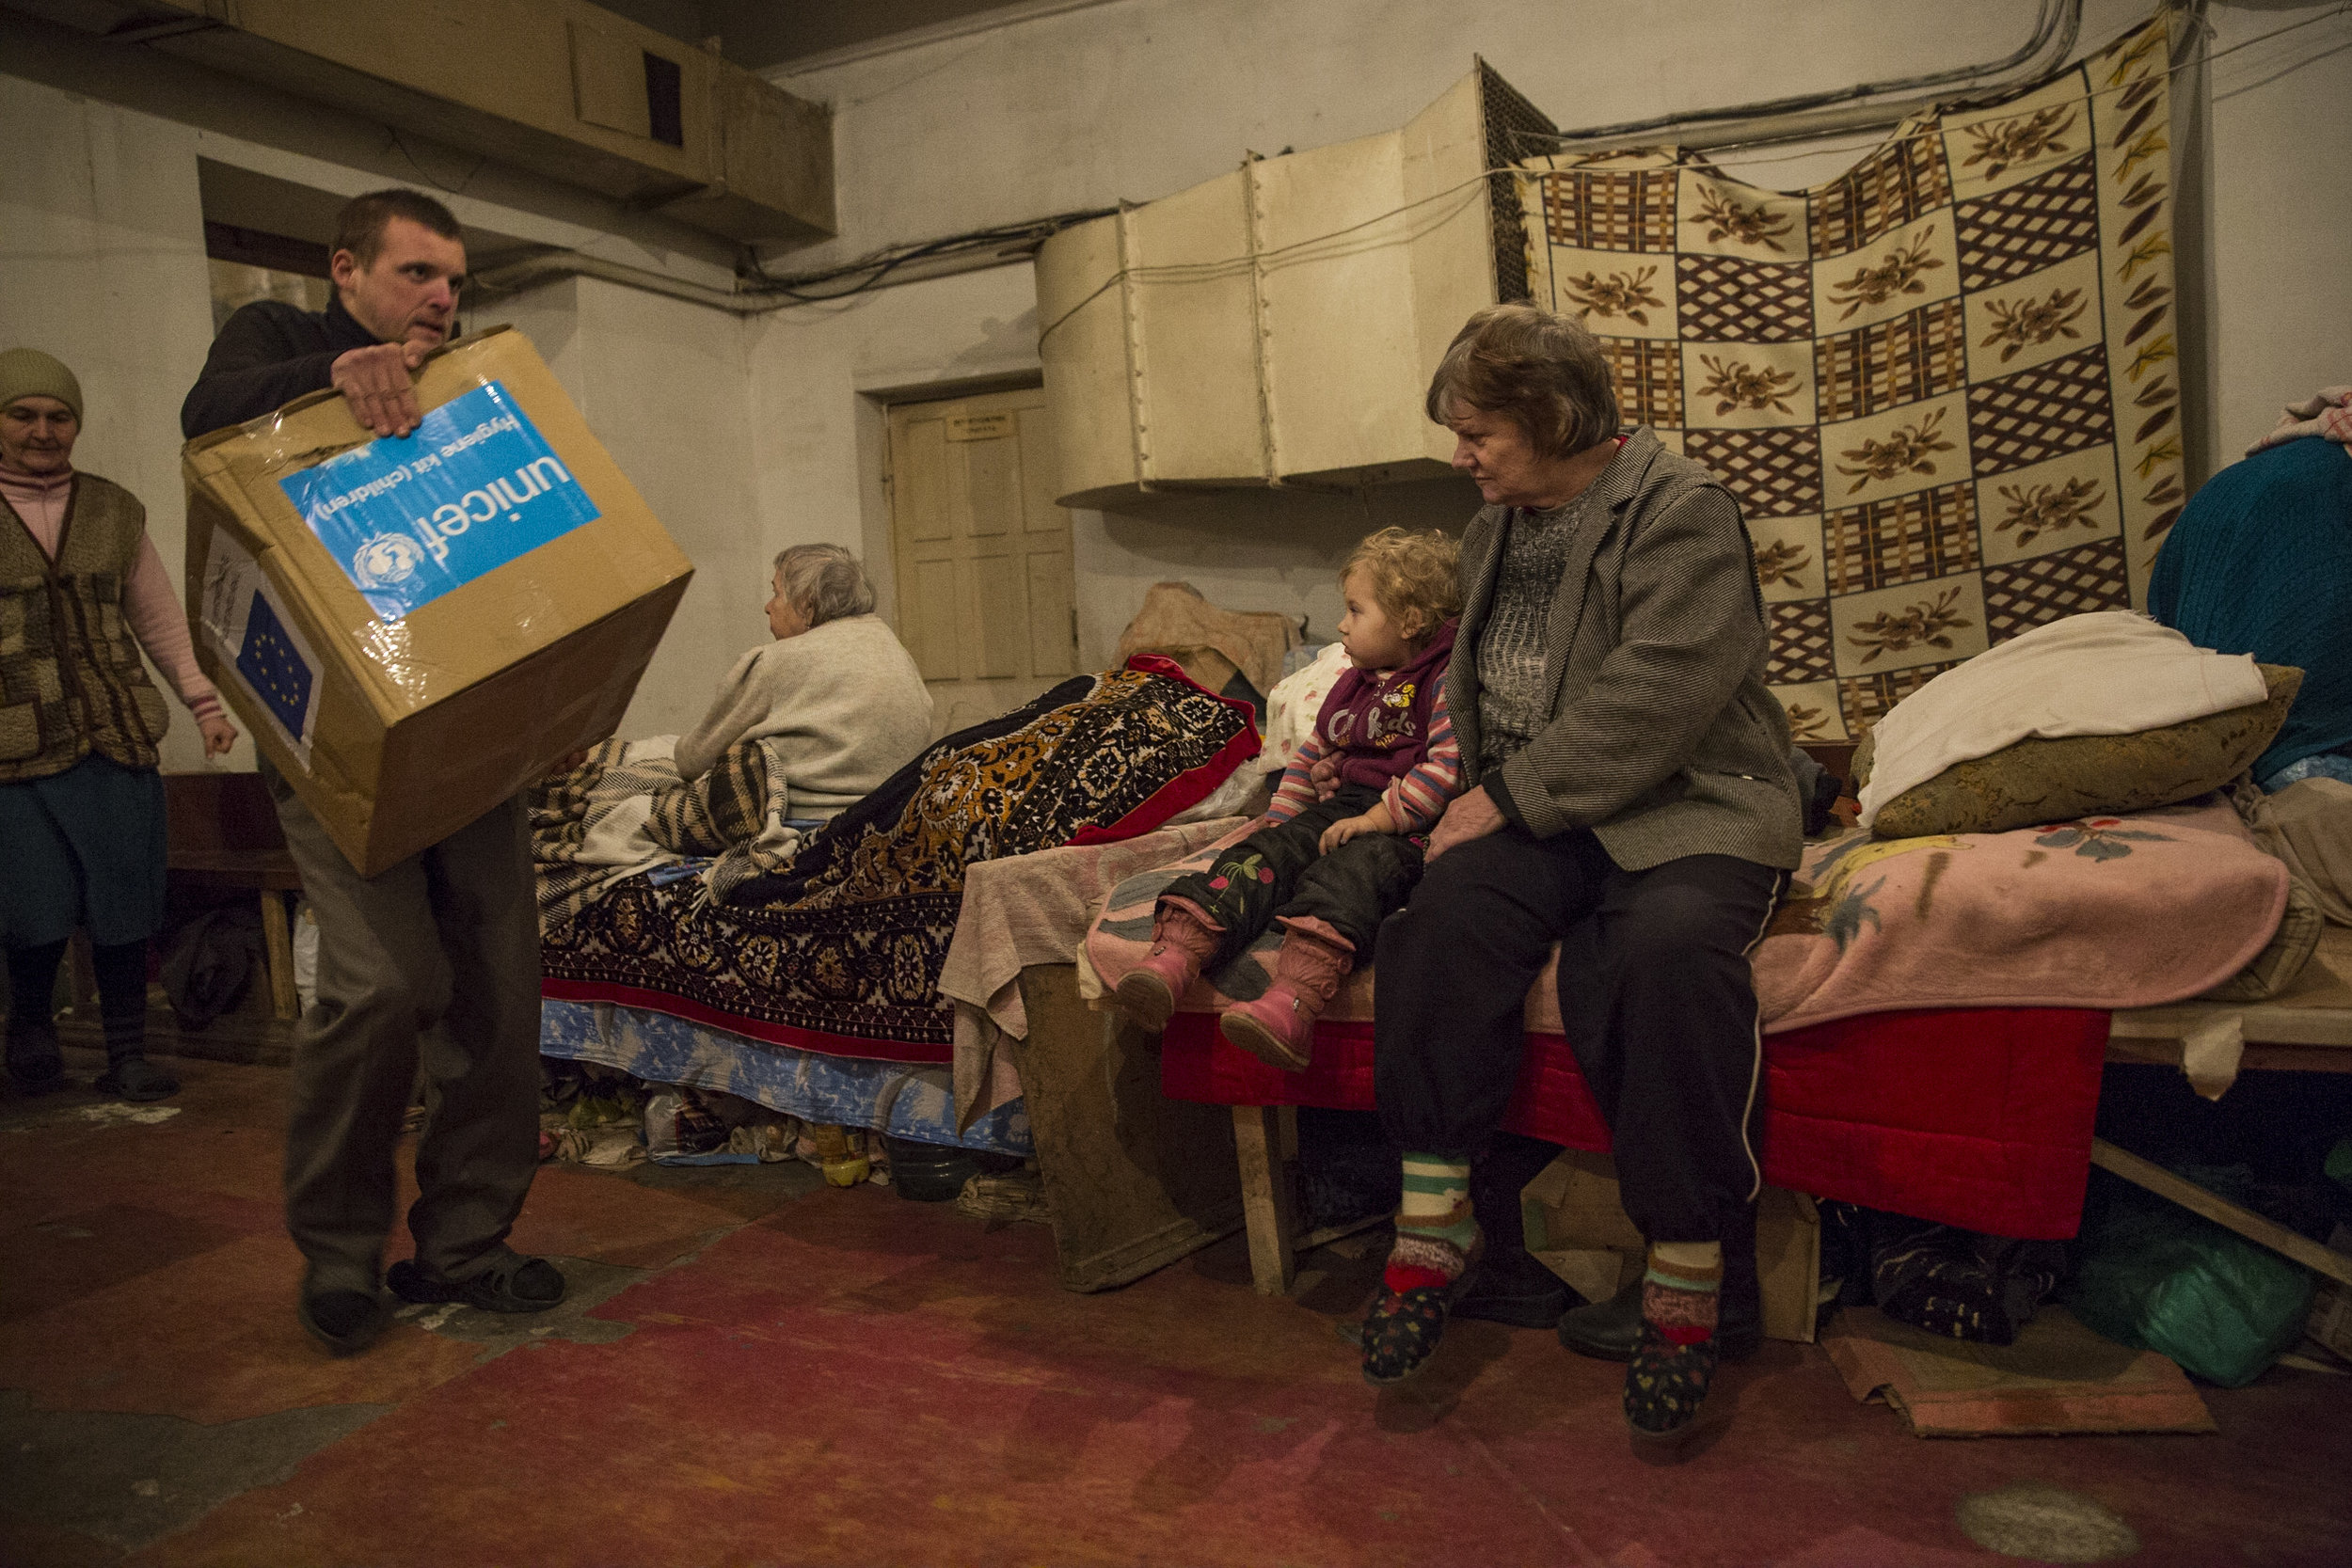 FRANCESCAVOLPI_UNICEF_EASTERN UKRAINE18.jpg